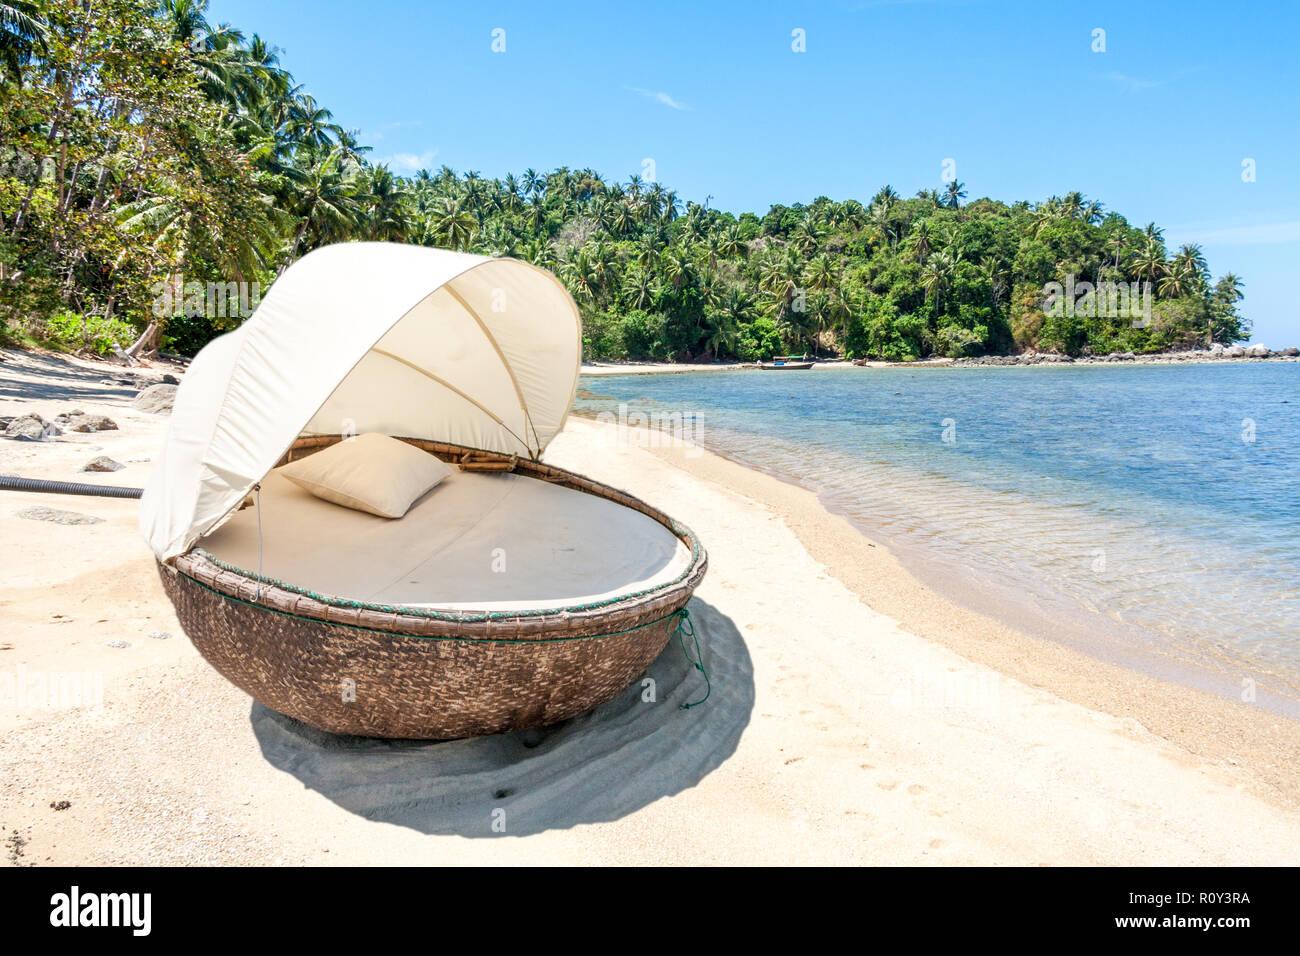 Cabana on tropical beach, Bang Tao, Phuket, Thailand - Stock Image